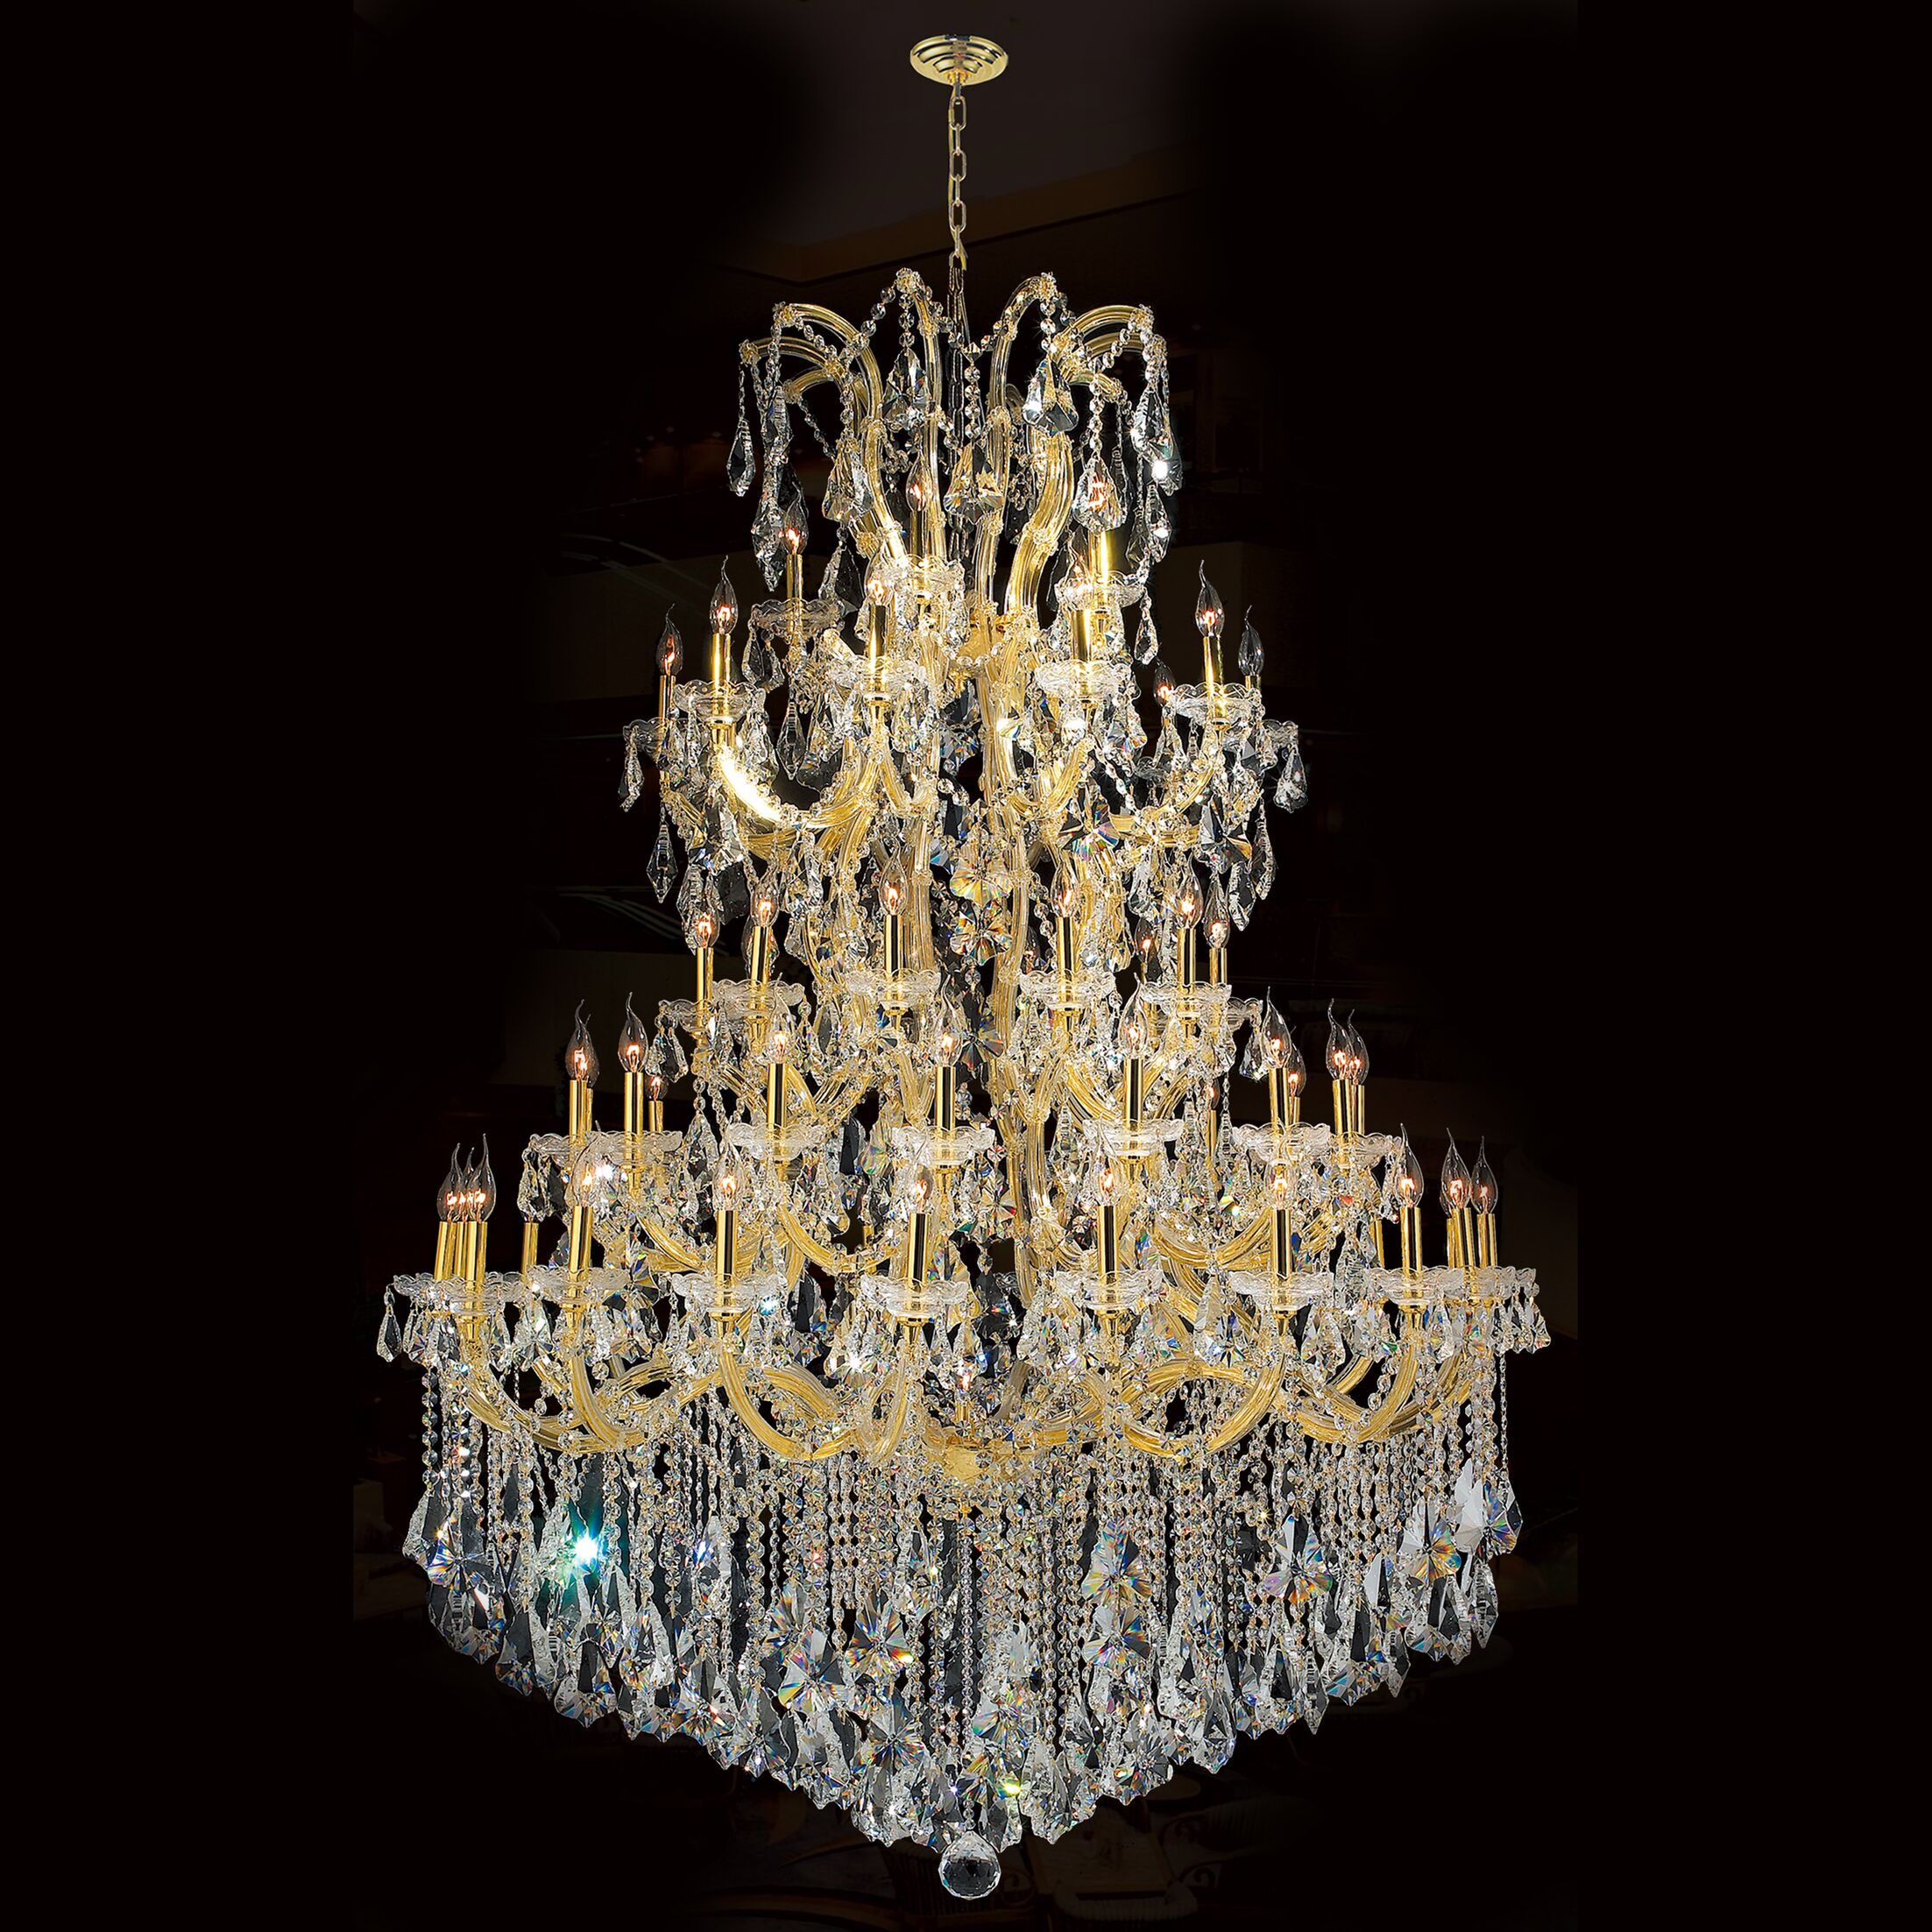 Kiazolu 61-Light Candle Style Chandelier Color: Gold